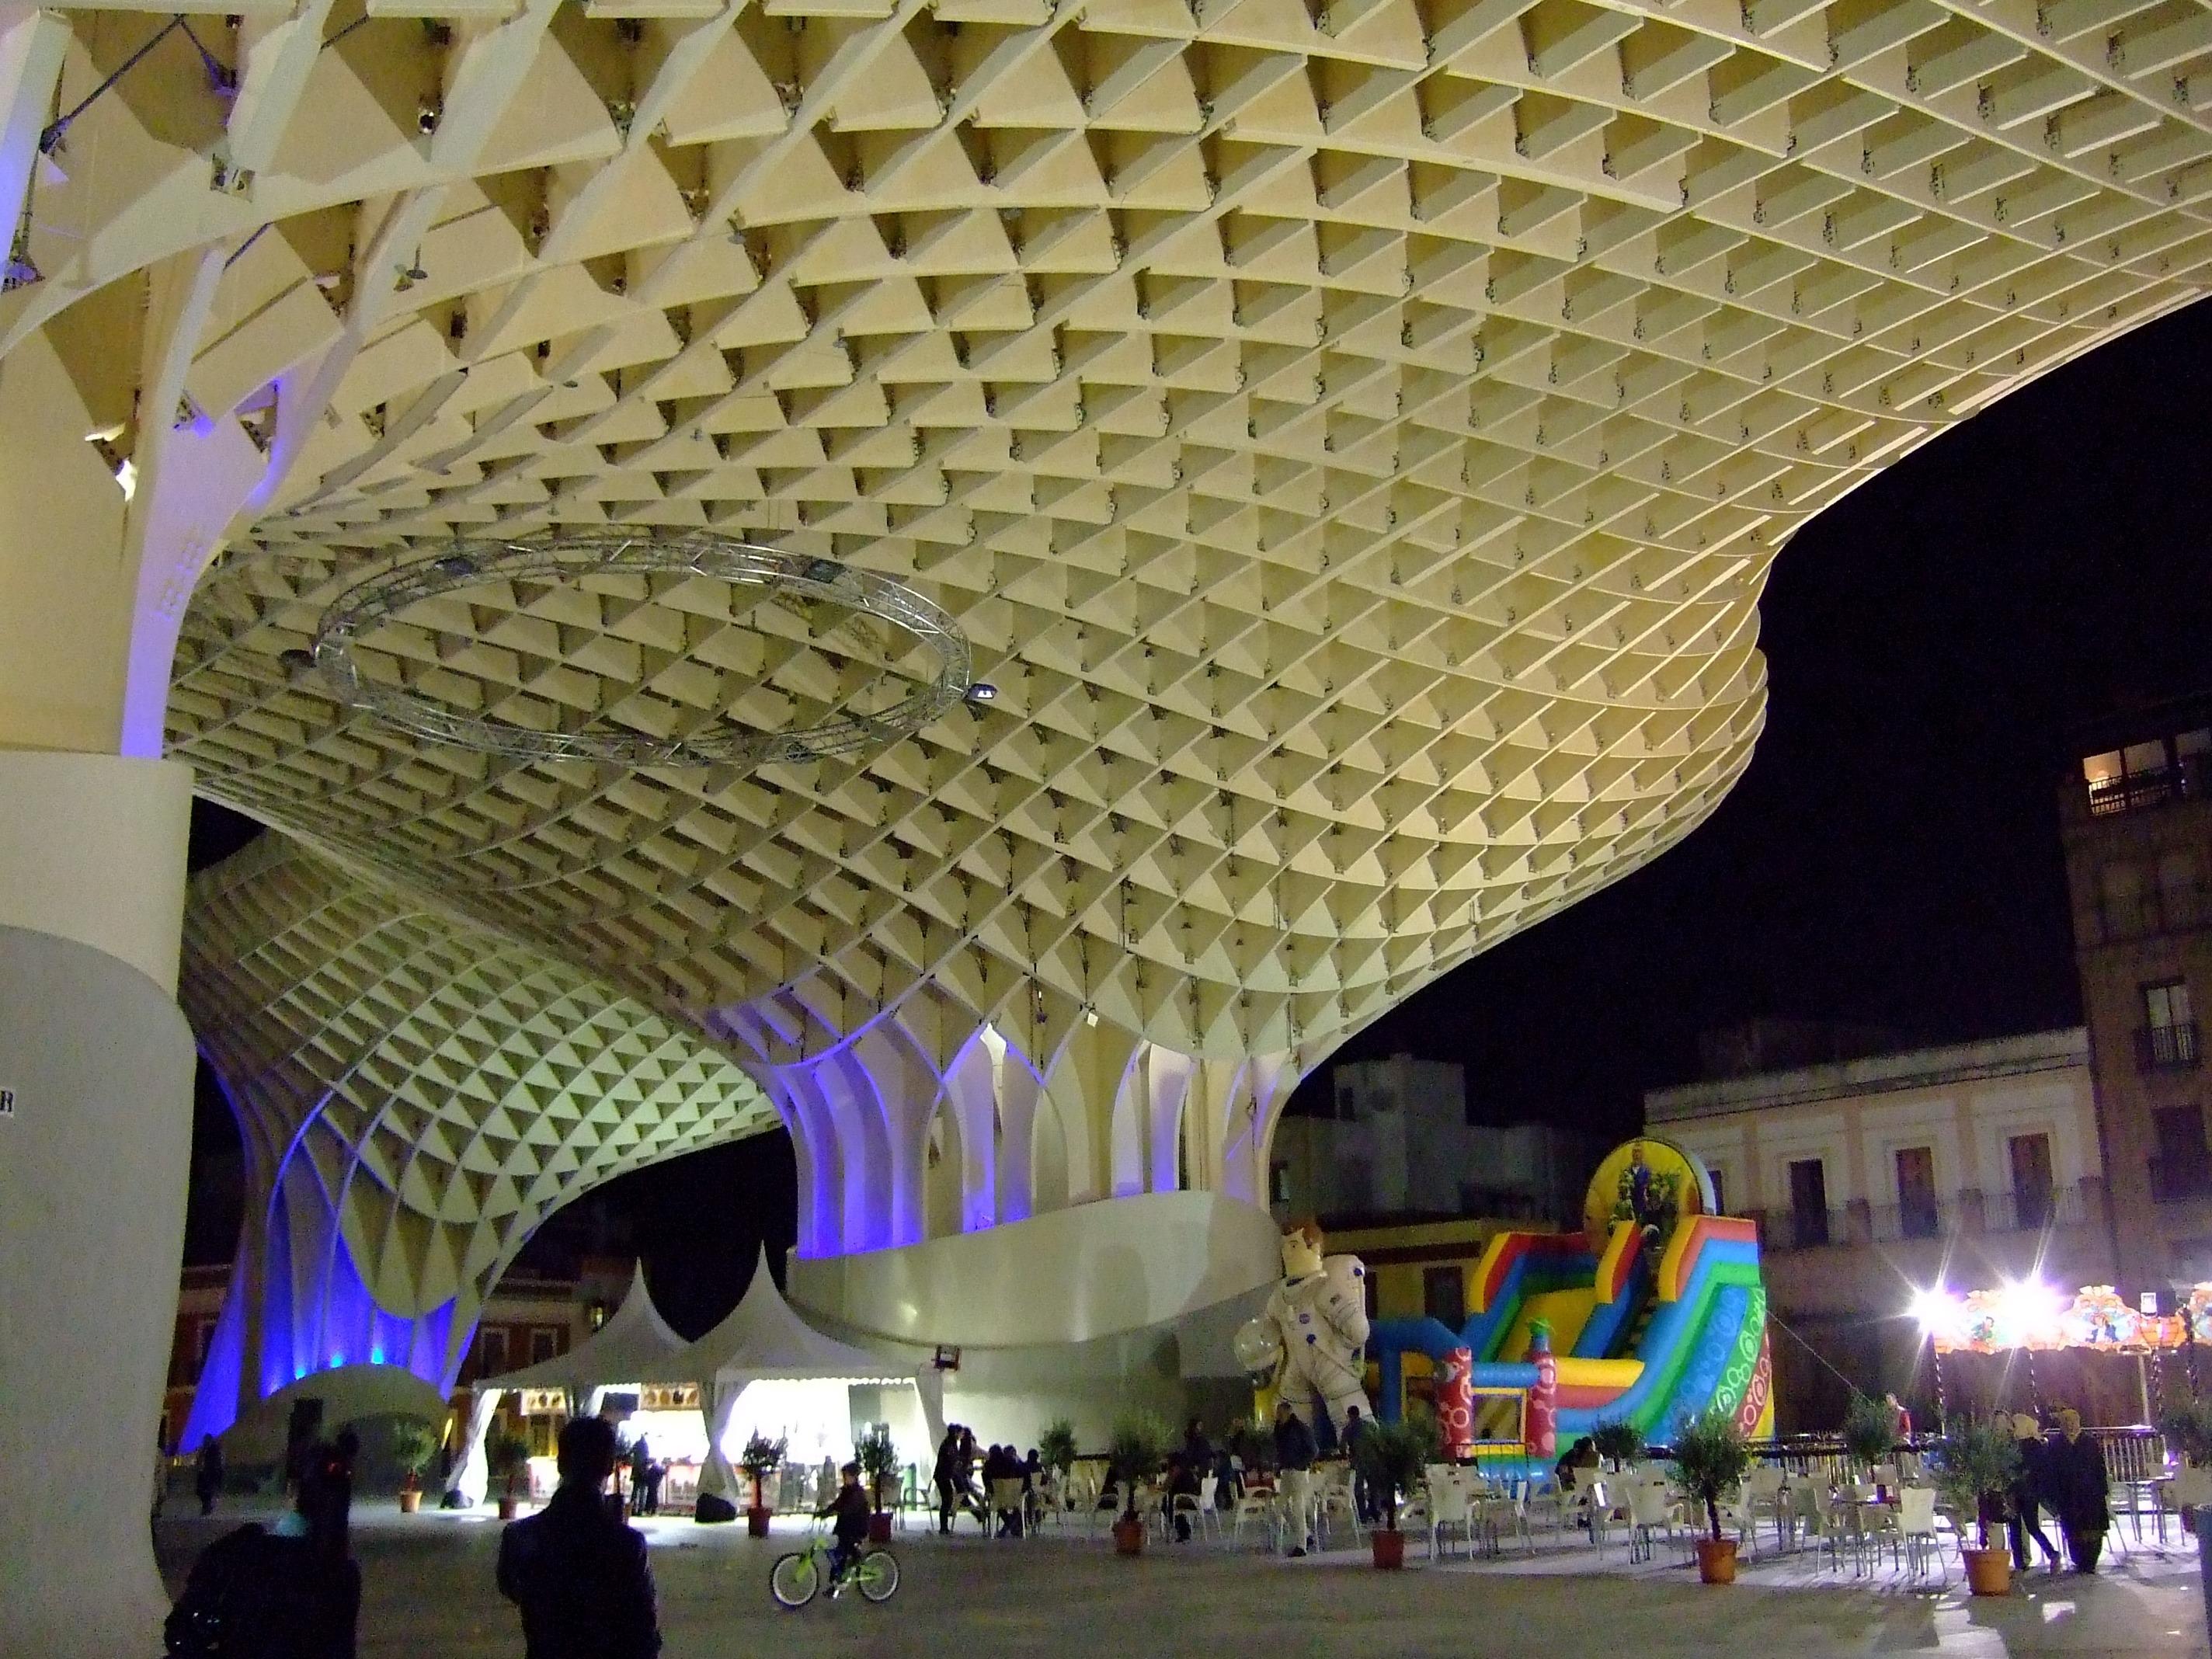 Fotos gratis arquitectura arena espa a sevilla - Arquitectura sevilla ...